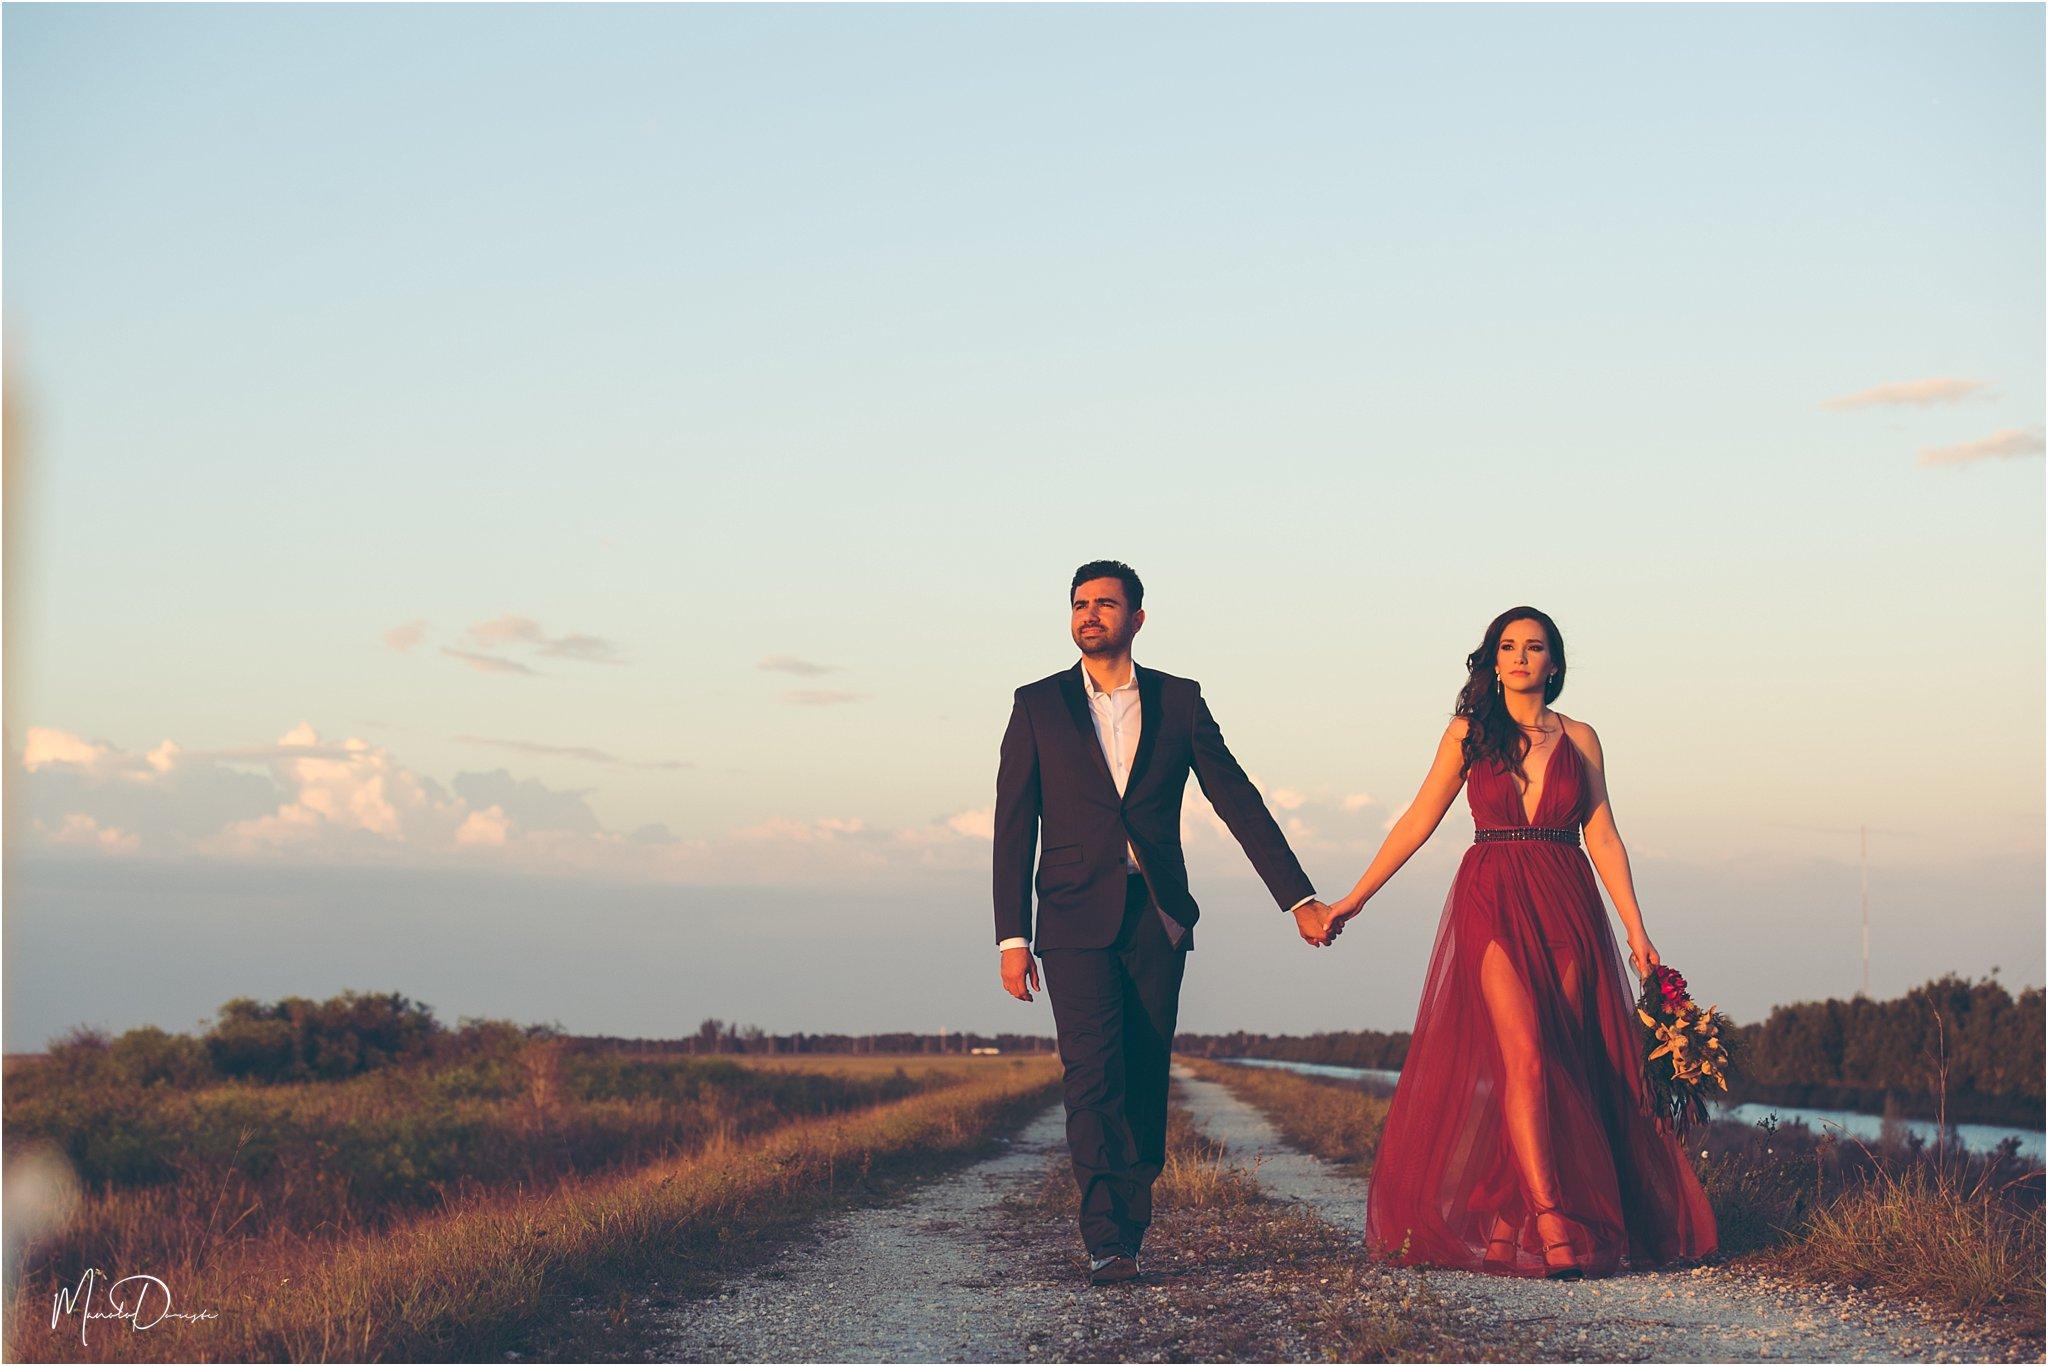 00823_ManoloDoreste_InFocusStudios_Wedding_Family_Photography_Miami_MiamiPhotographer.jpg